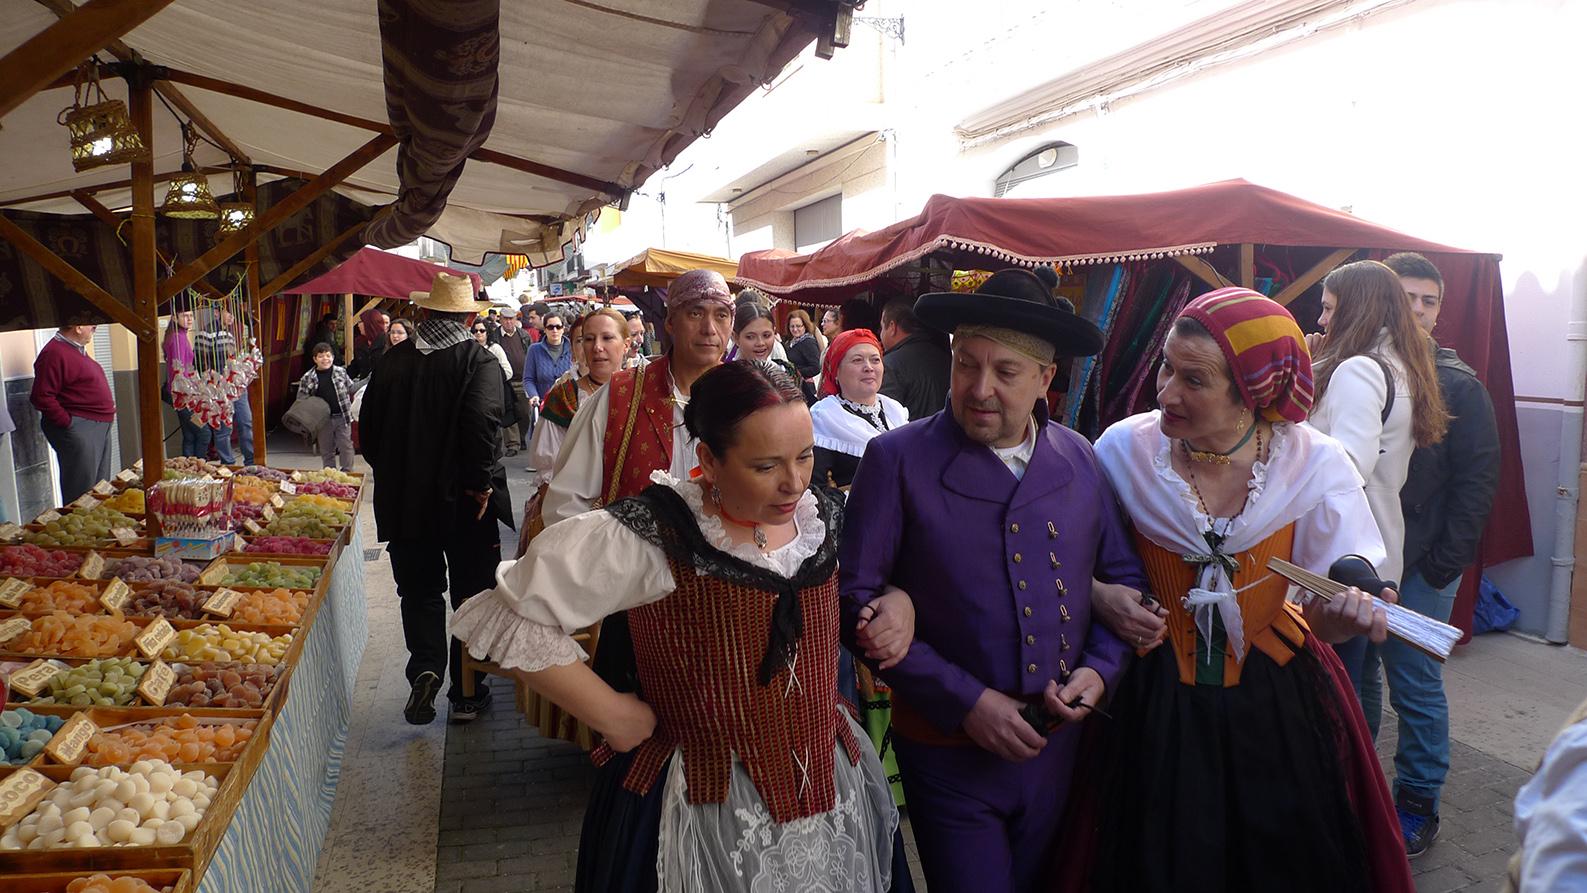 2014-02-23 - Baladre a Fira St. Marcia-ROTOVA (2)